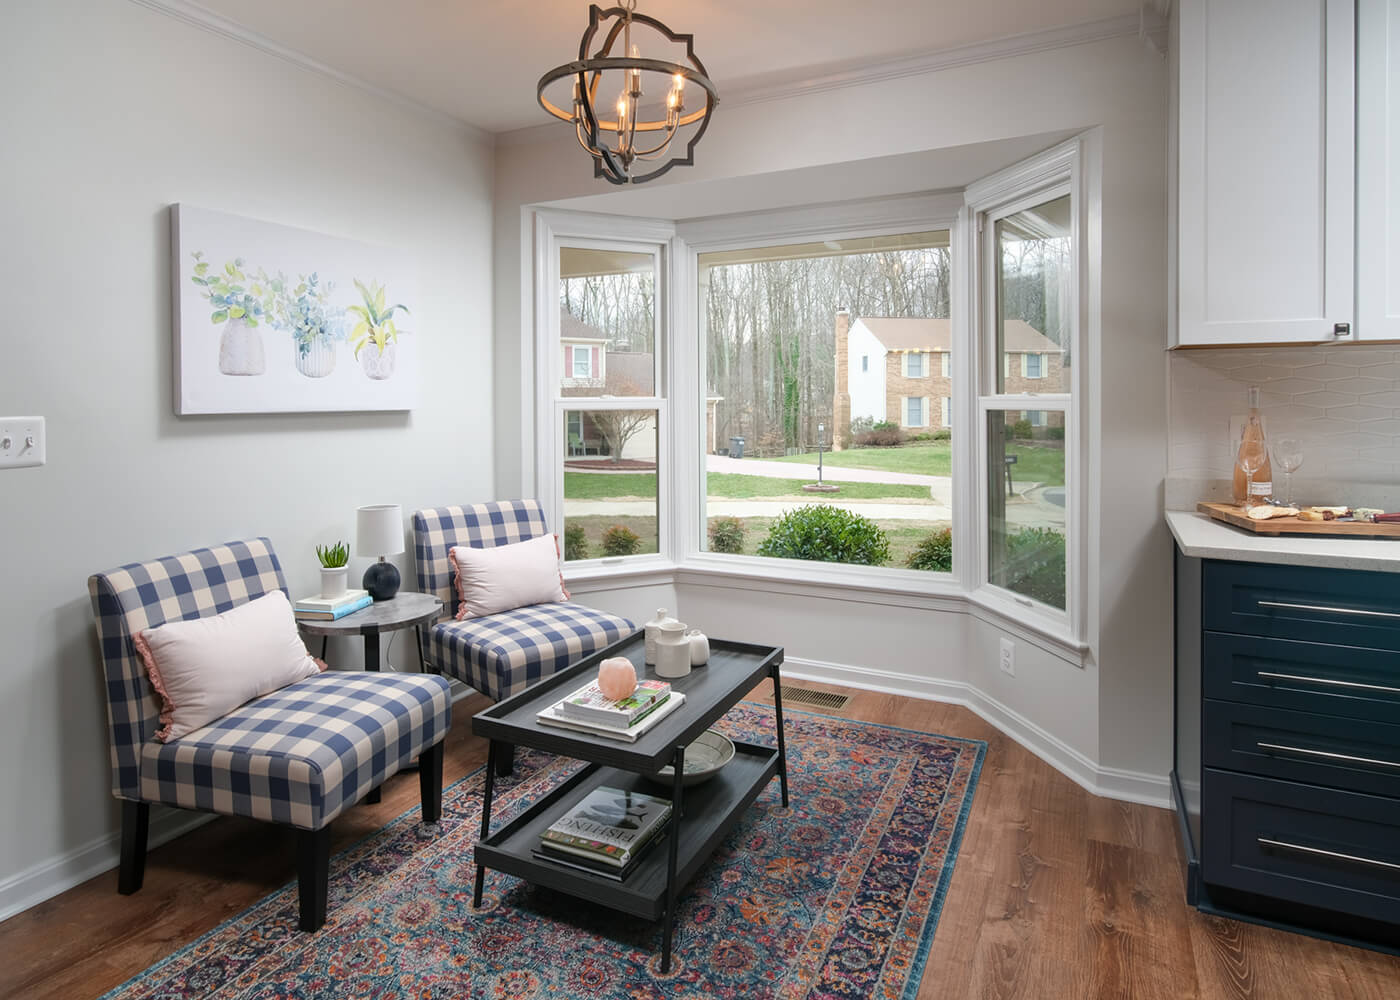 Furniture & Styling Interior Designer